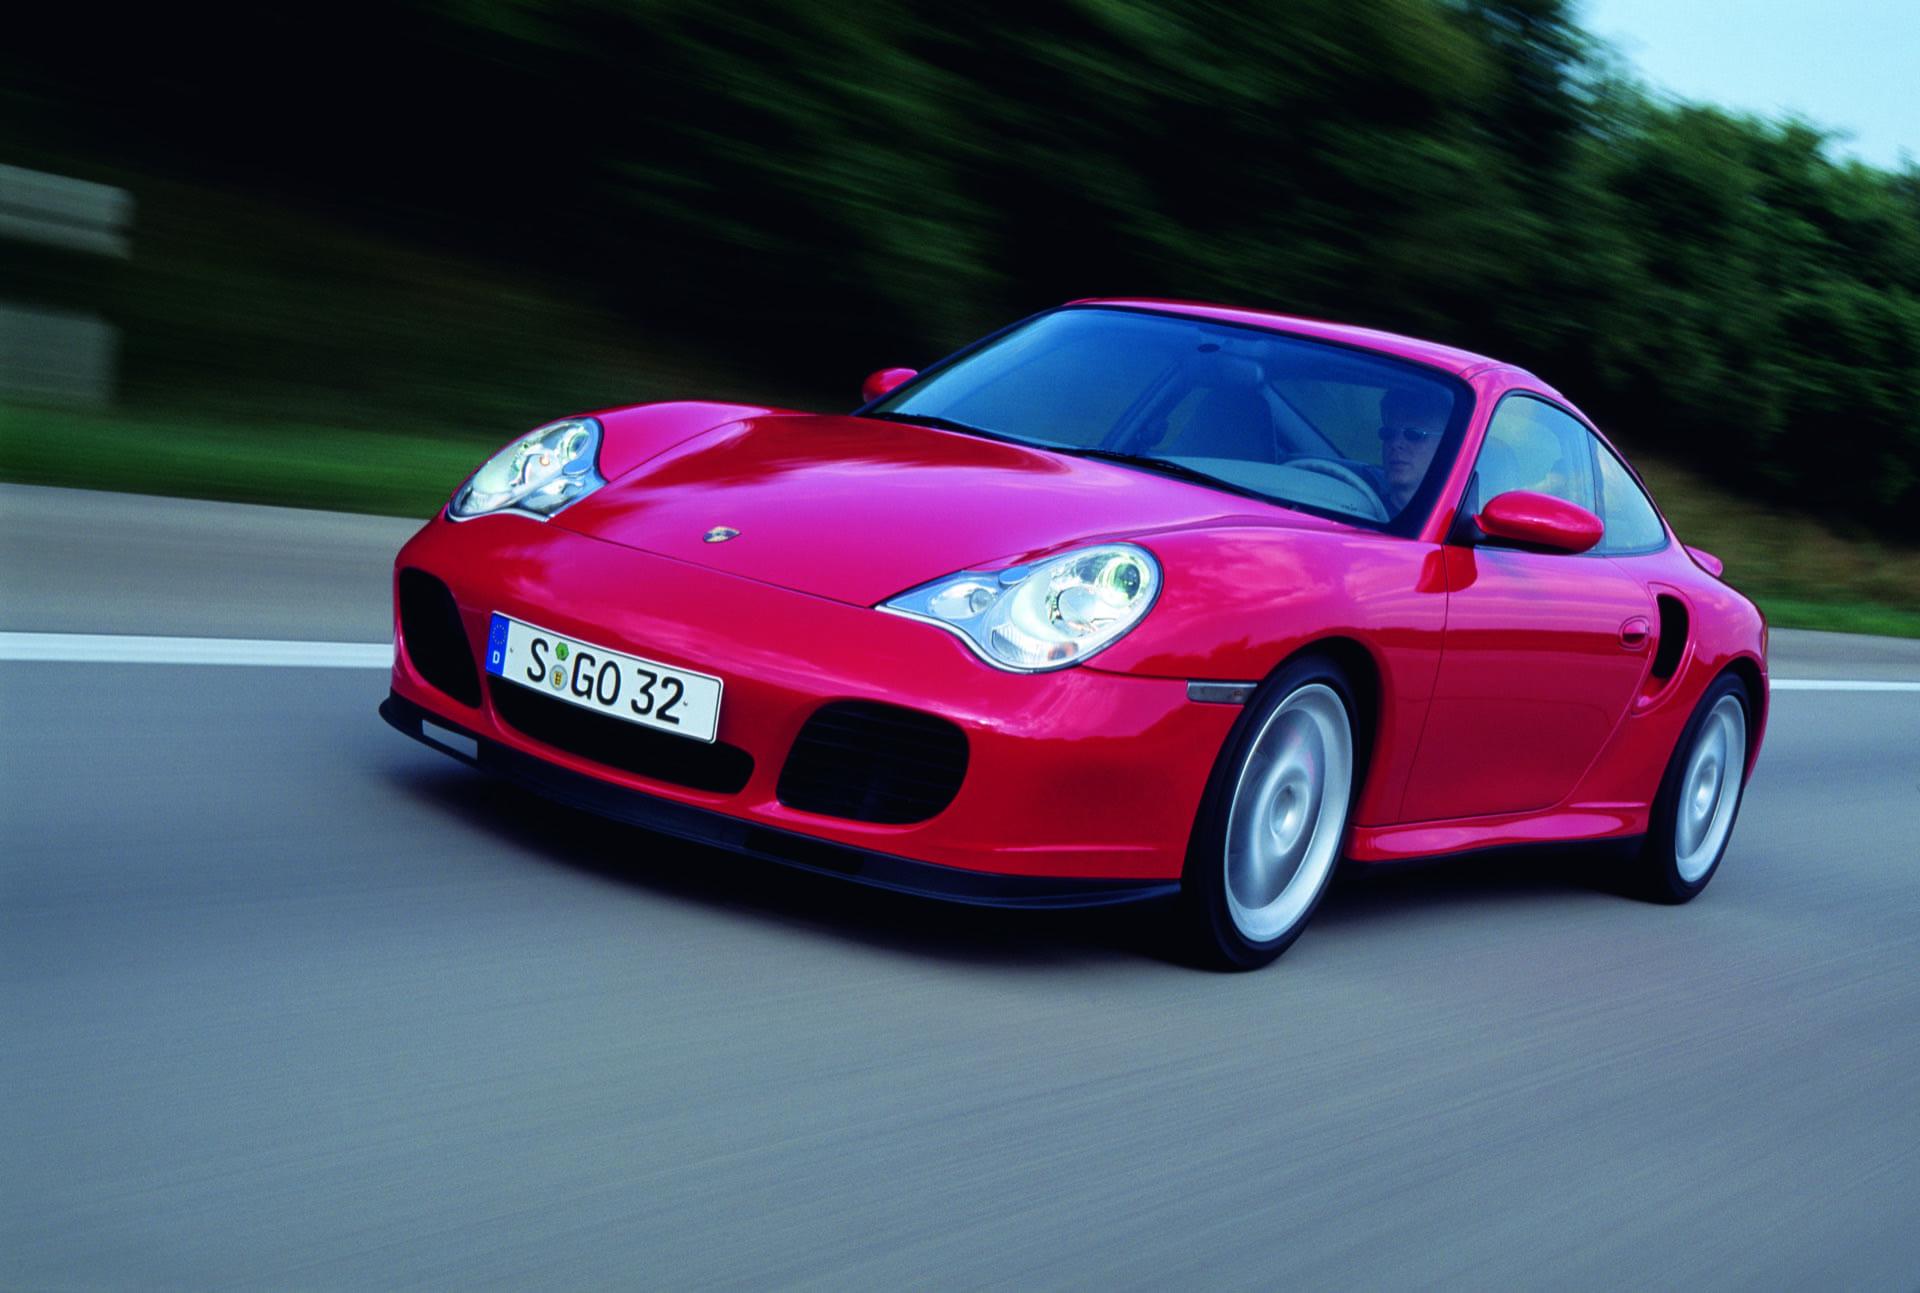 Porsche 911 996 Turbo 2004